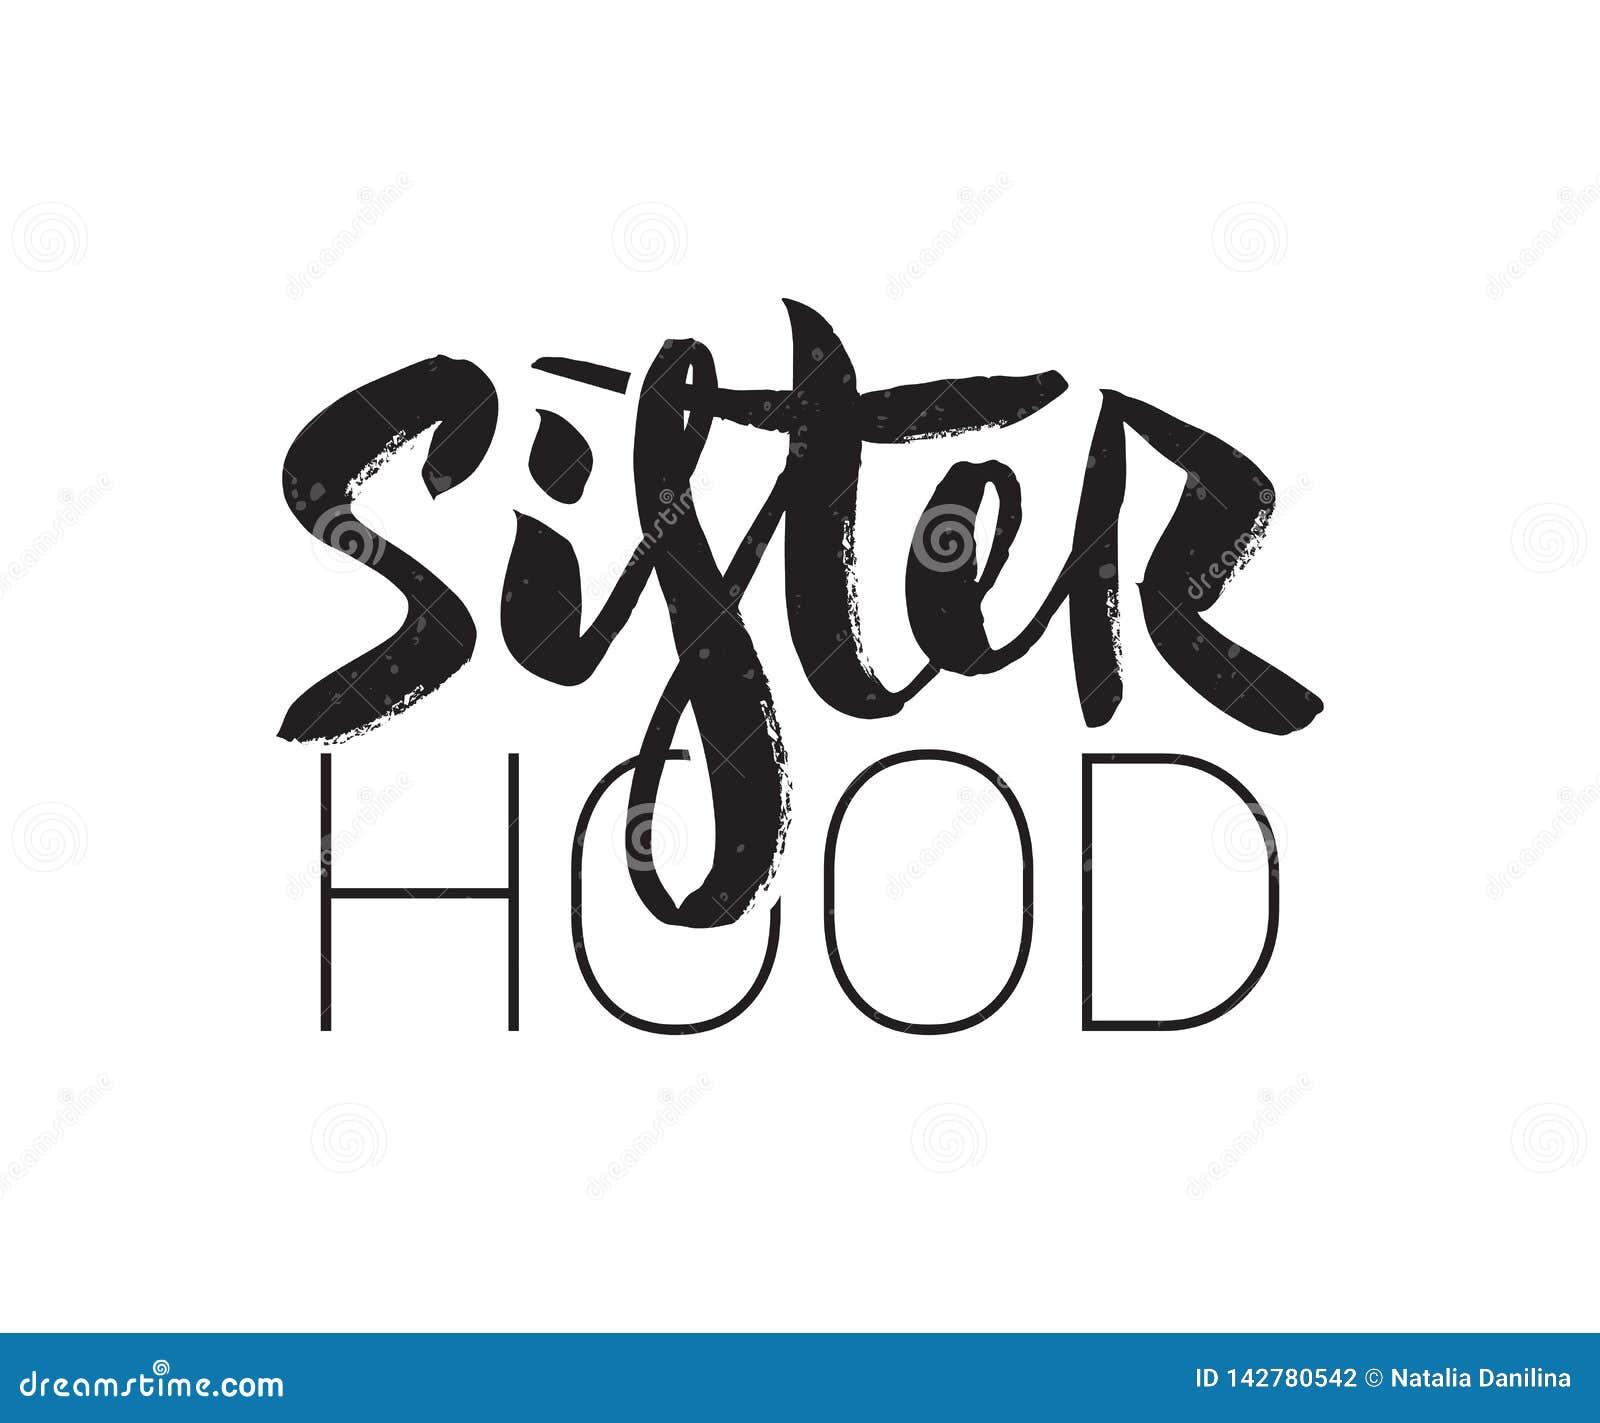 Vector illustration of Sisterhood title for card, invitation. Feminism concept.